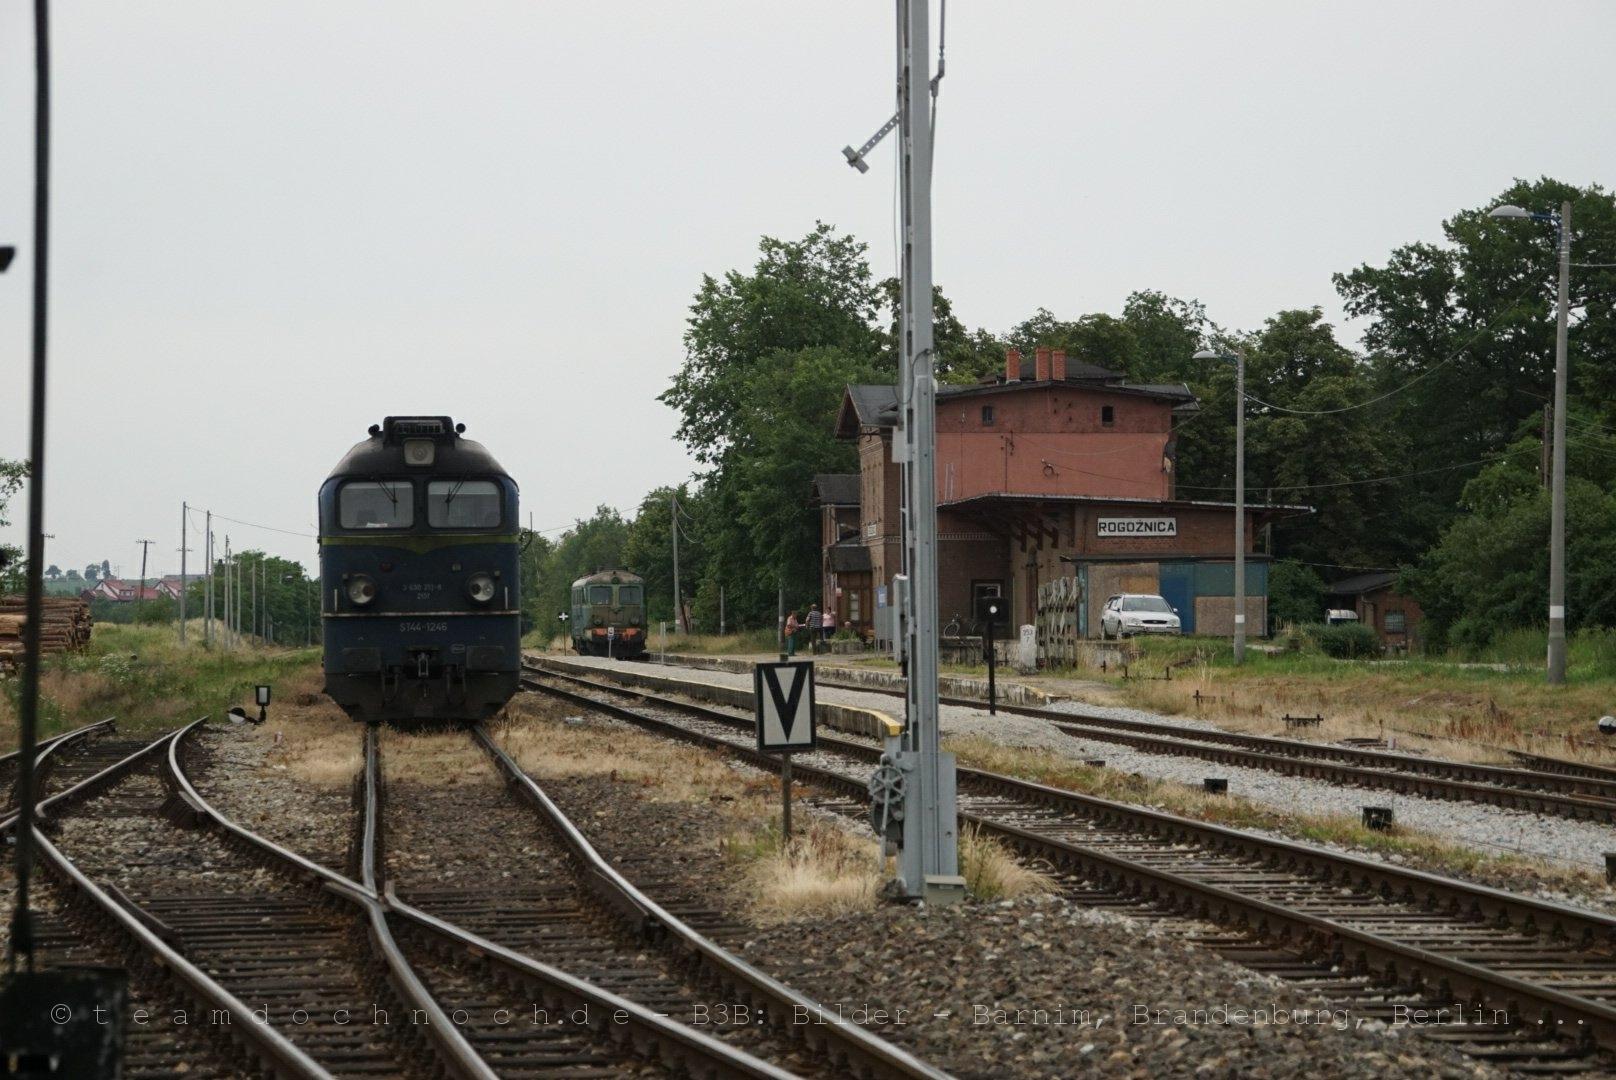 ST44 1246 und ST43 334 in Rogoznica